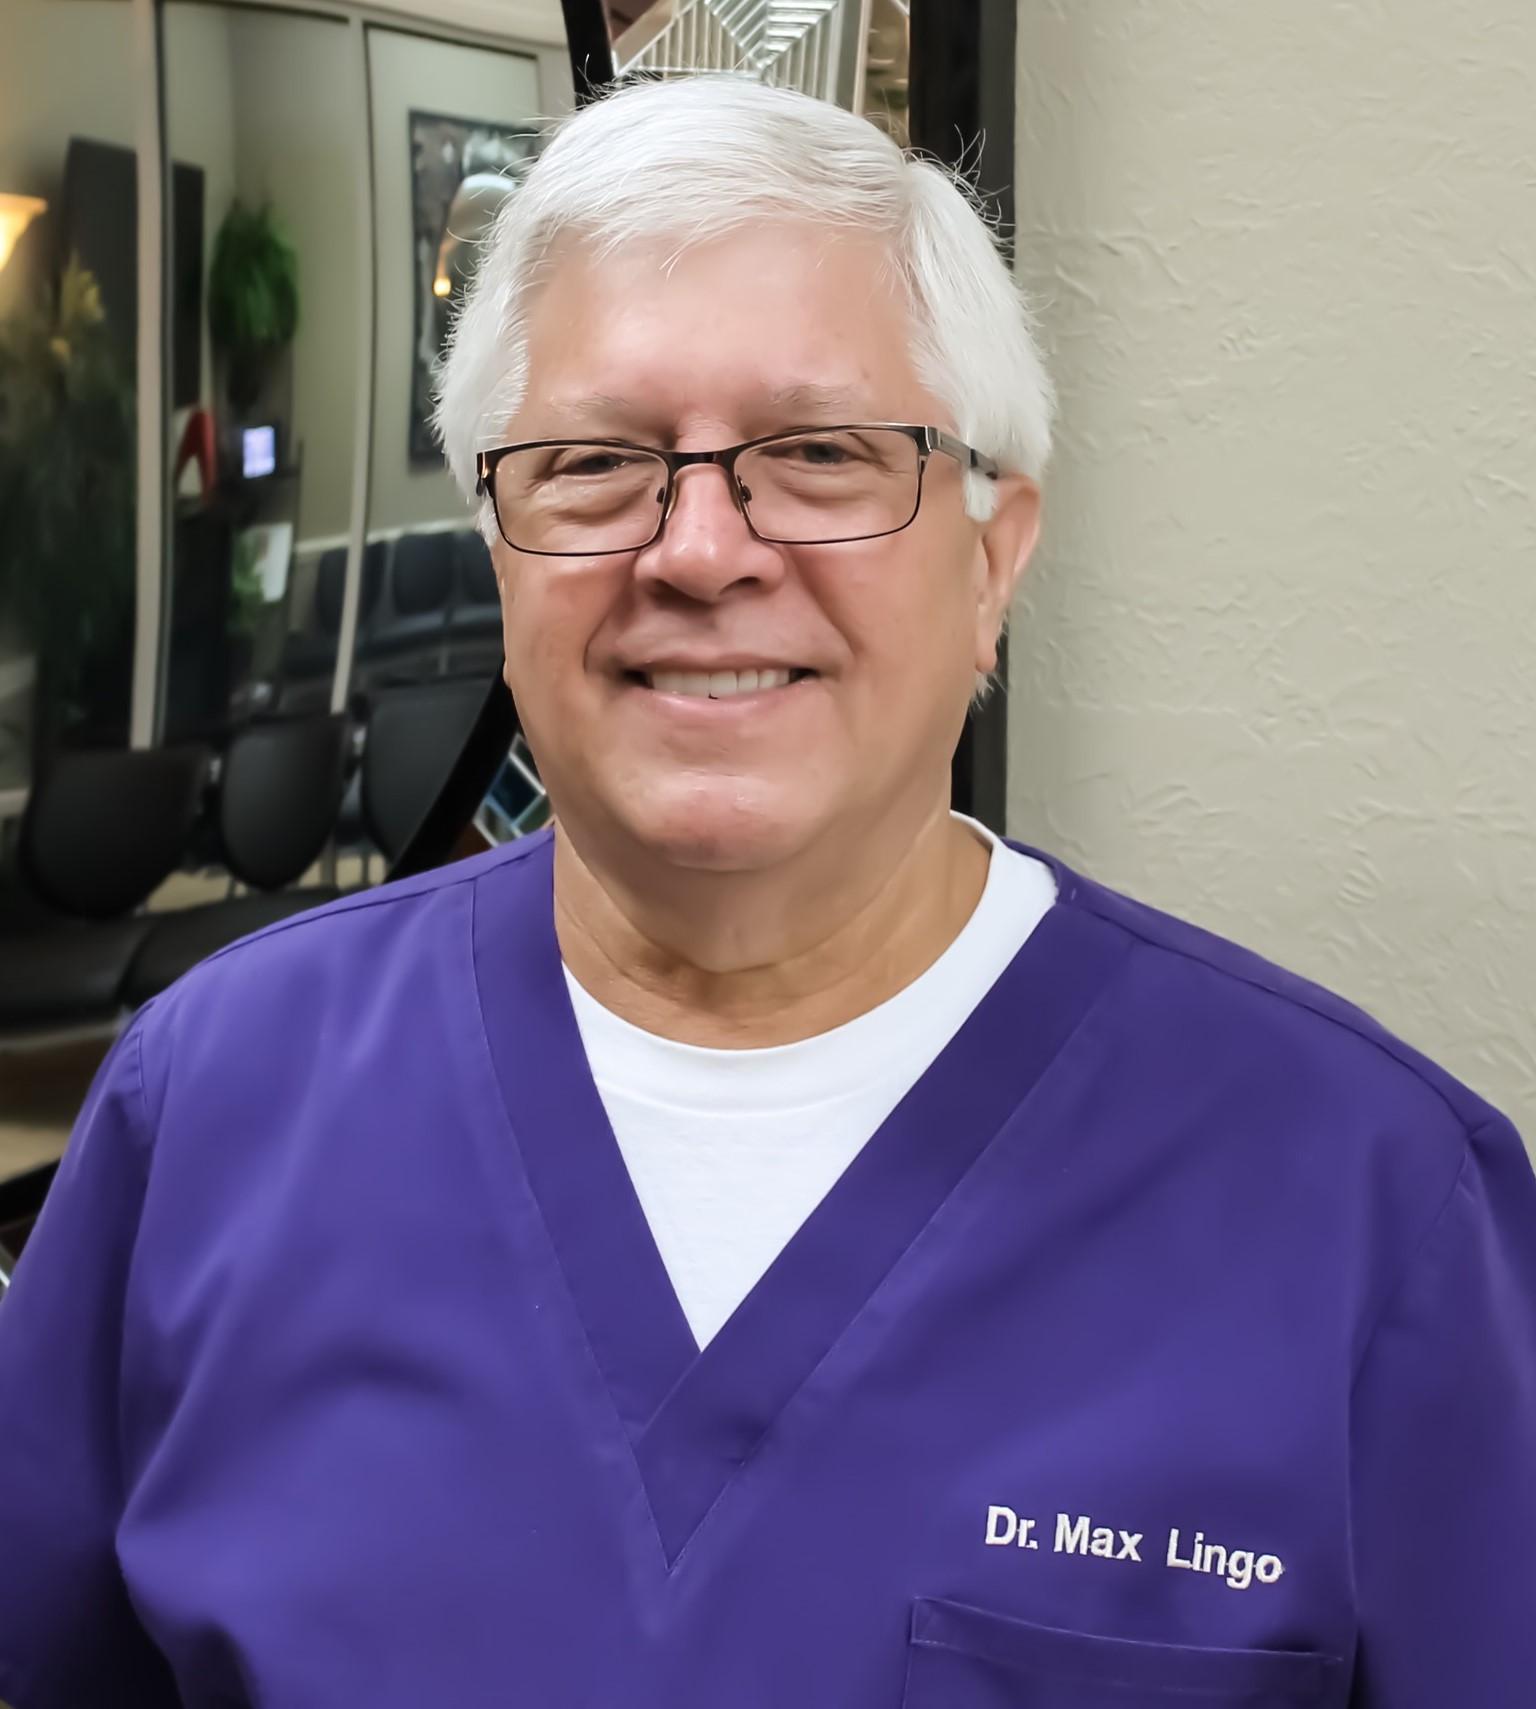 Max headshot purple scrubs for paper - Max L Lingo, DDS